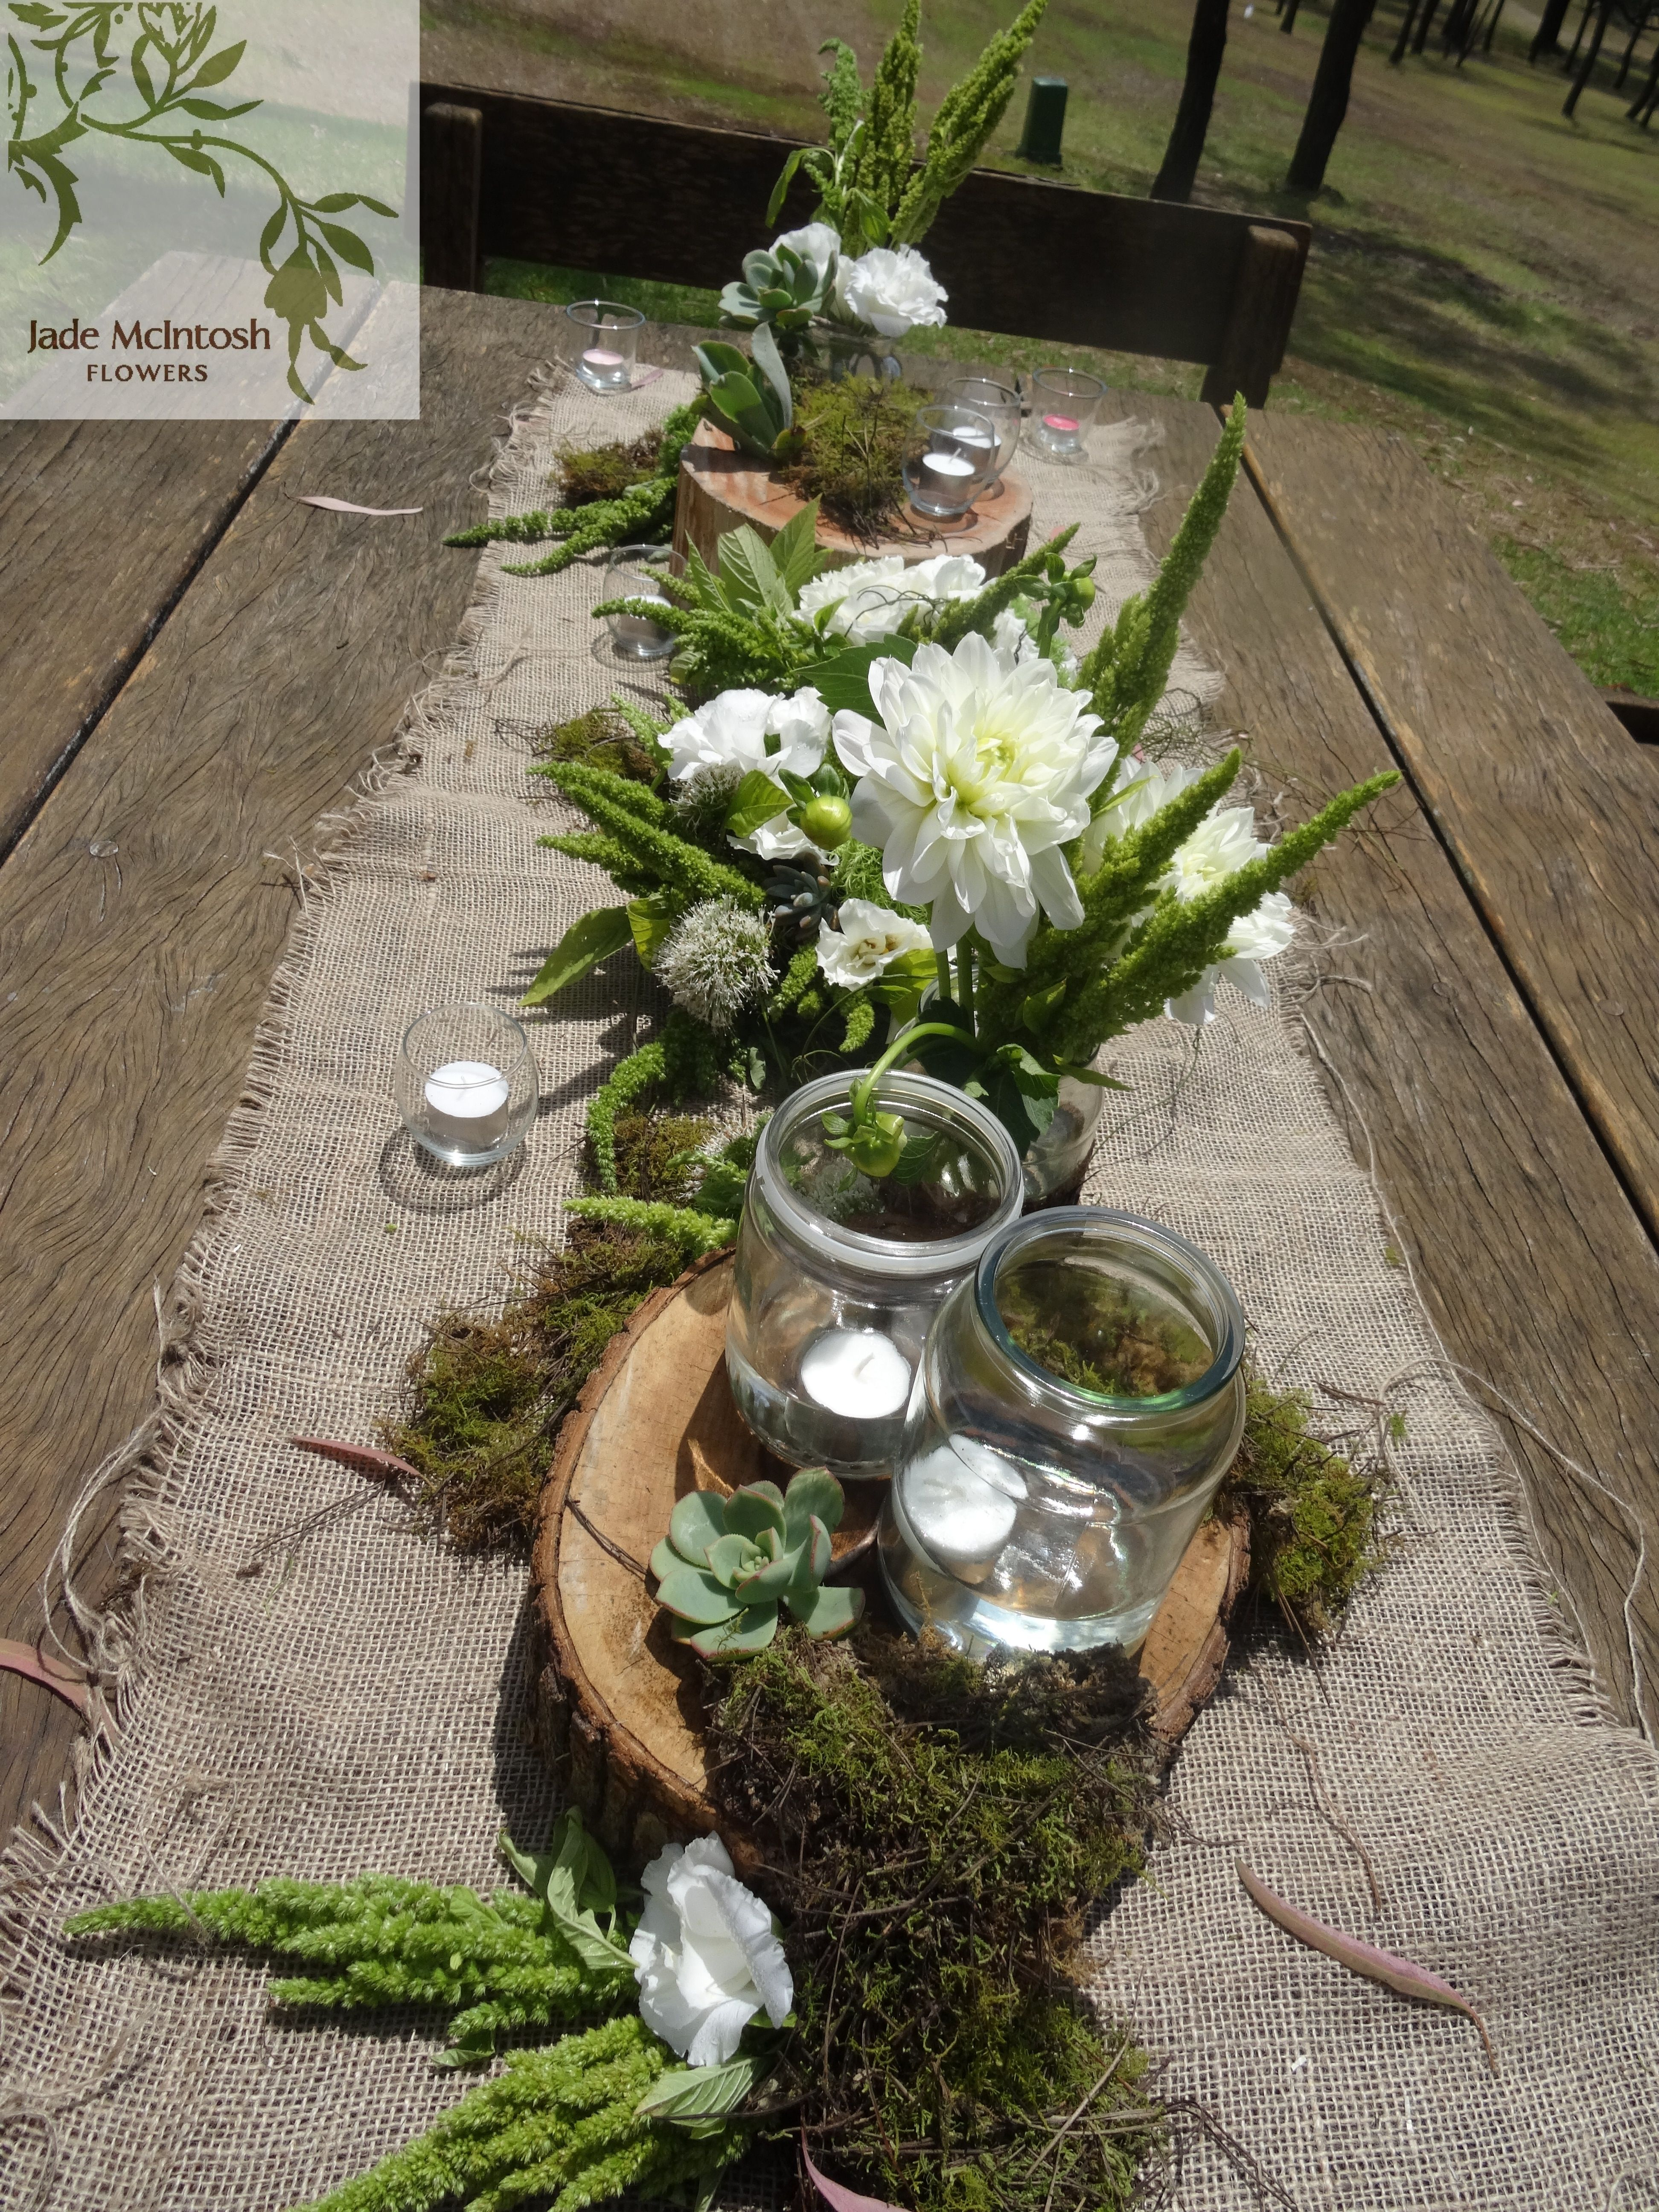 Rustic Outdoor Reception Using Hessian Table Runners Mason Jar